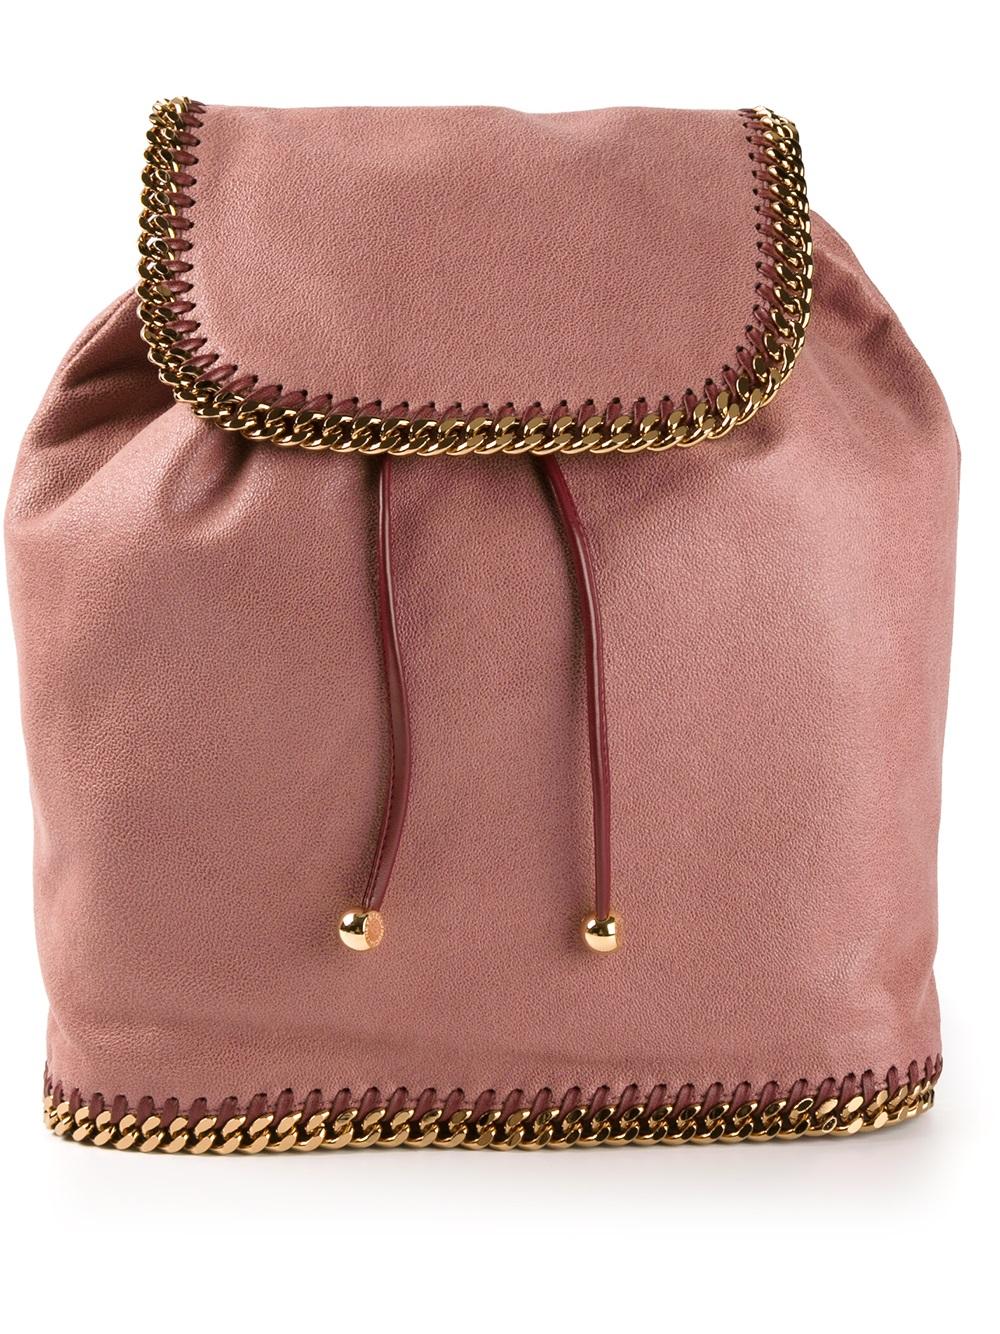 stella mccartney backpack in pink pink purple lyst. Black Bedroom Furniture Sets. Home Design Ideas